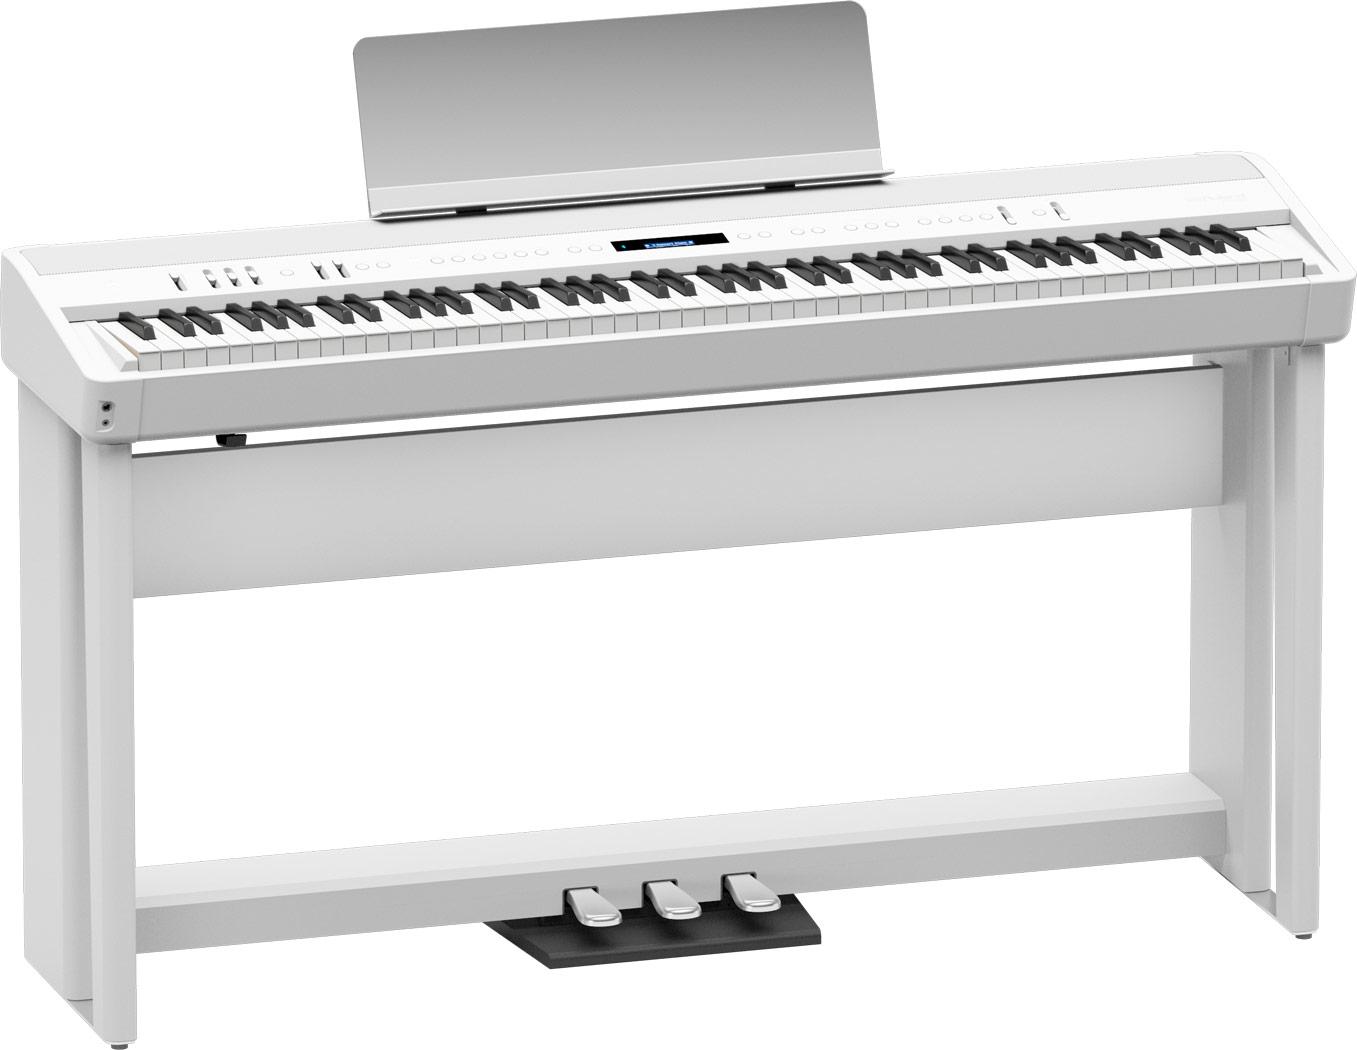 Roland Piano Repair Manual